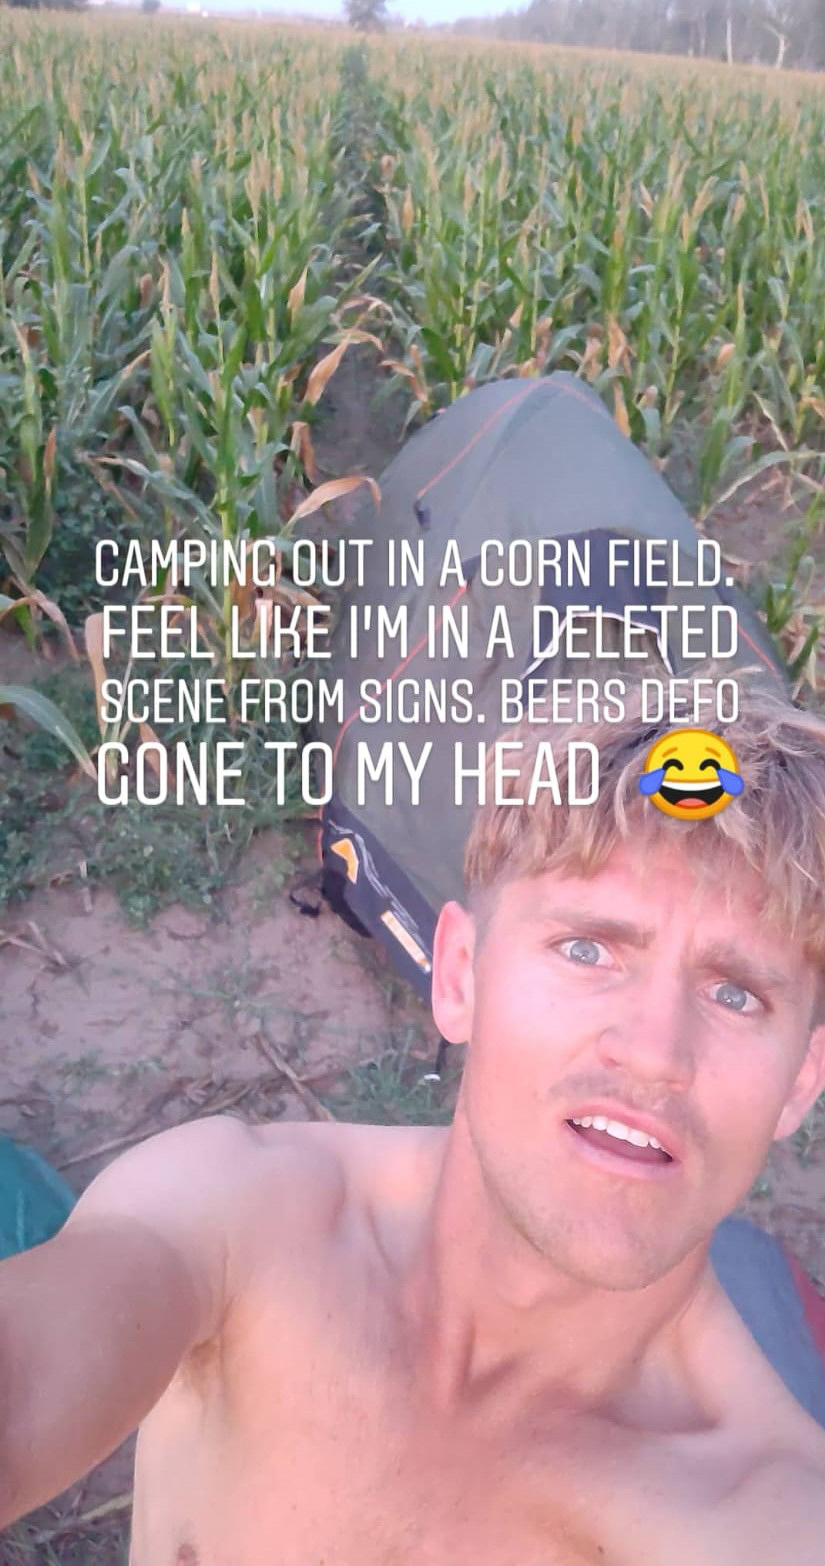 Camping in a Maize field